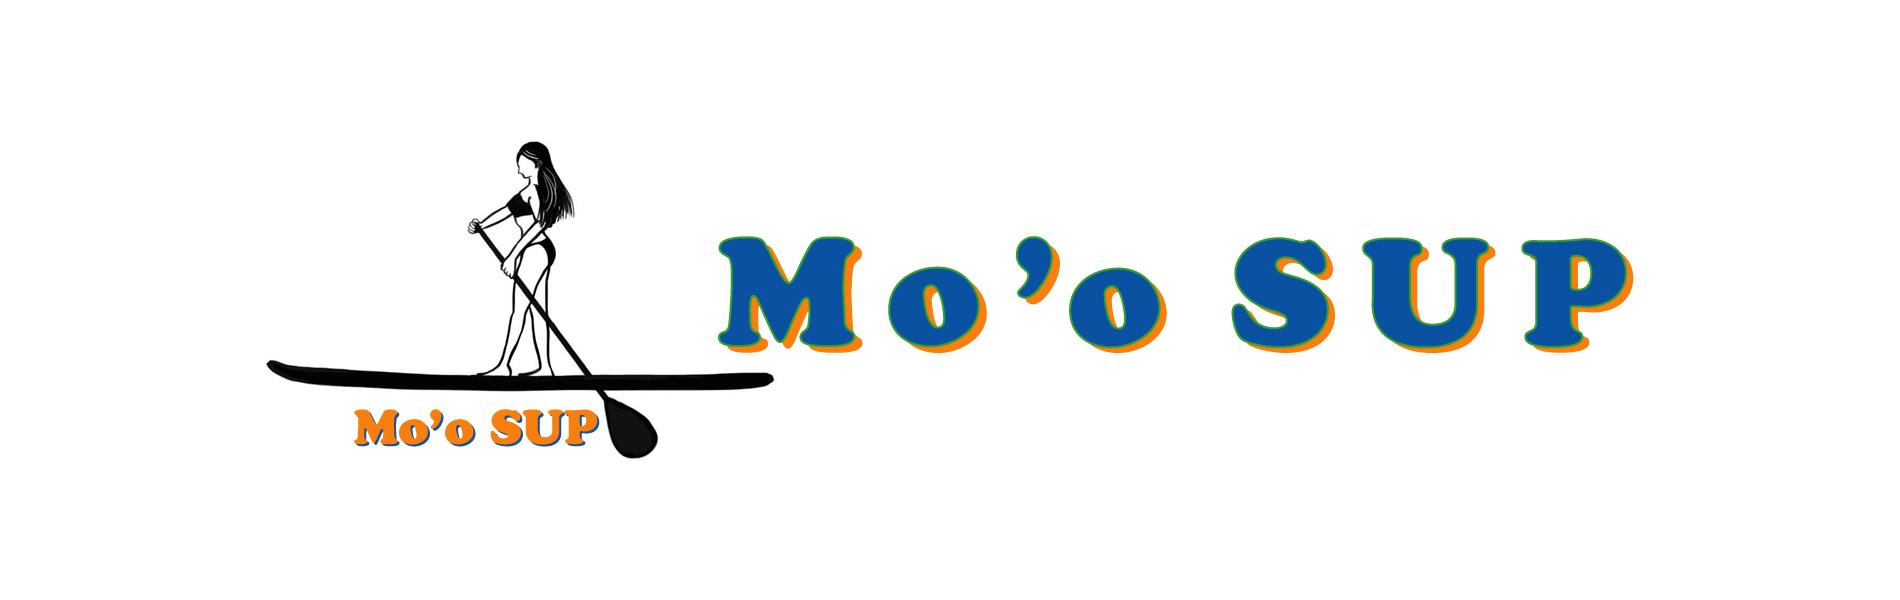 Mo'o SUP モオサップ宮古島のホームページ。